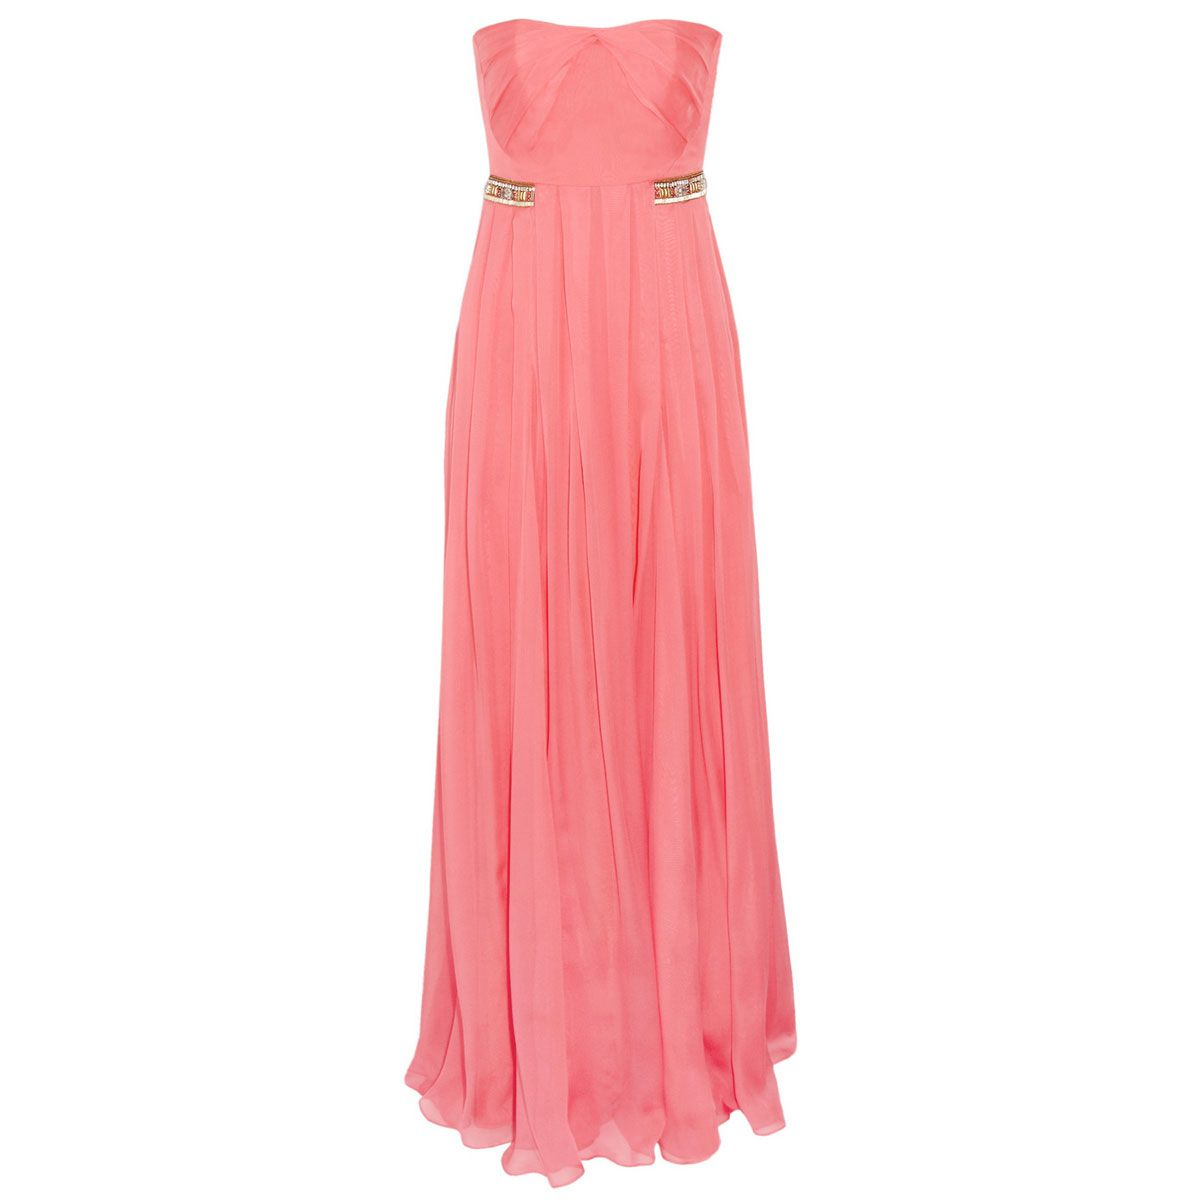 e244bb1d1c 45 Stunning Nontraditional Wedding Dresses - The Cut Matthew Williamson  embellished silk-chiffon gown Estilo